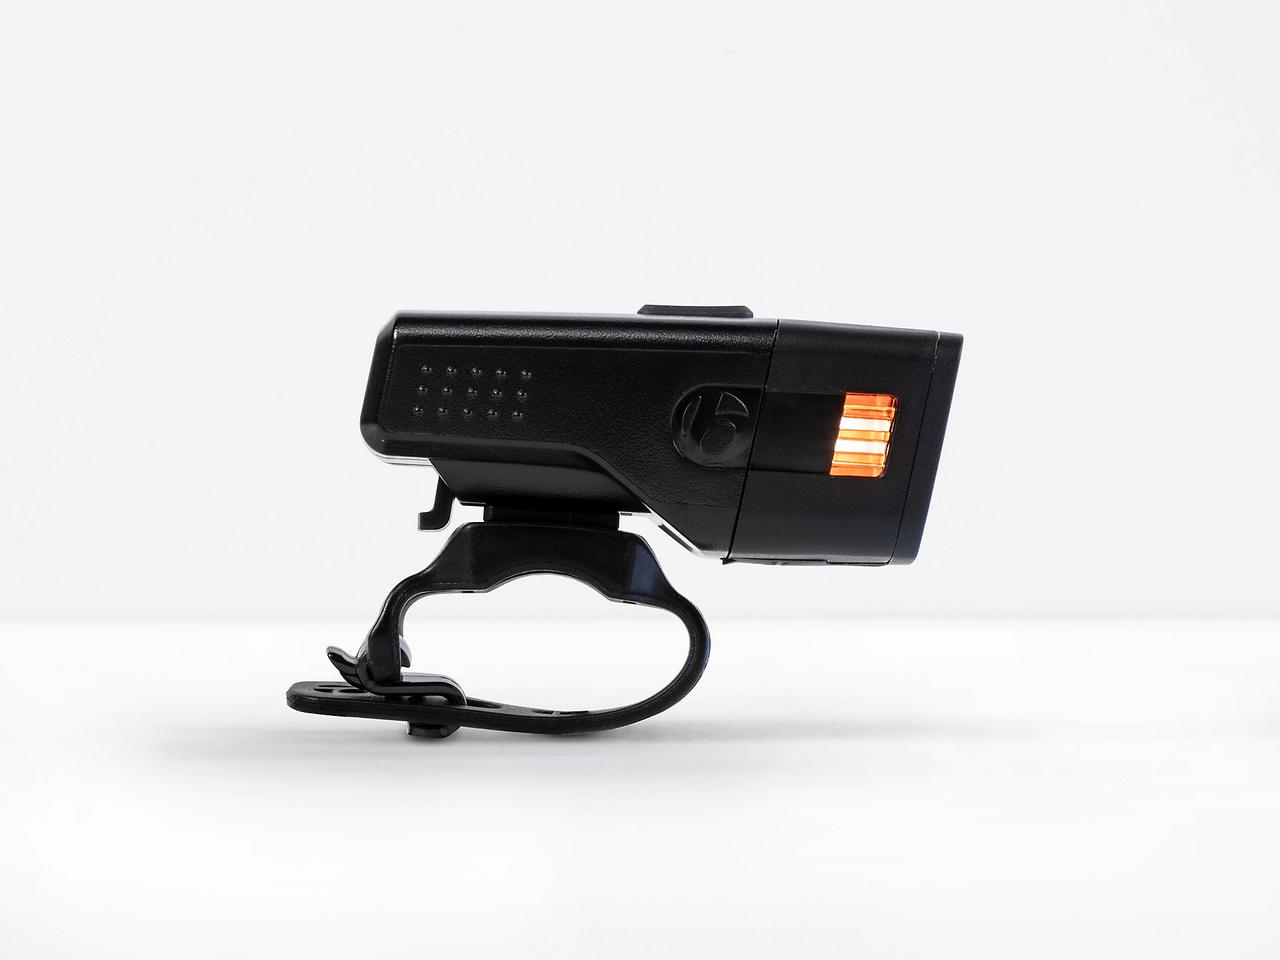 FAROL BONTRAGER PARA BICICLETA ION 450 RFT (560978)